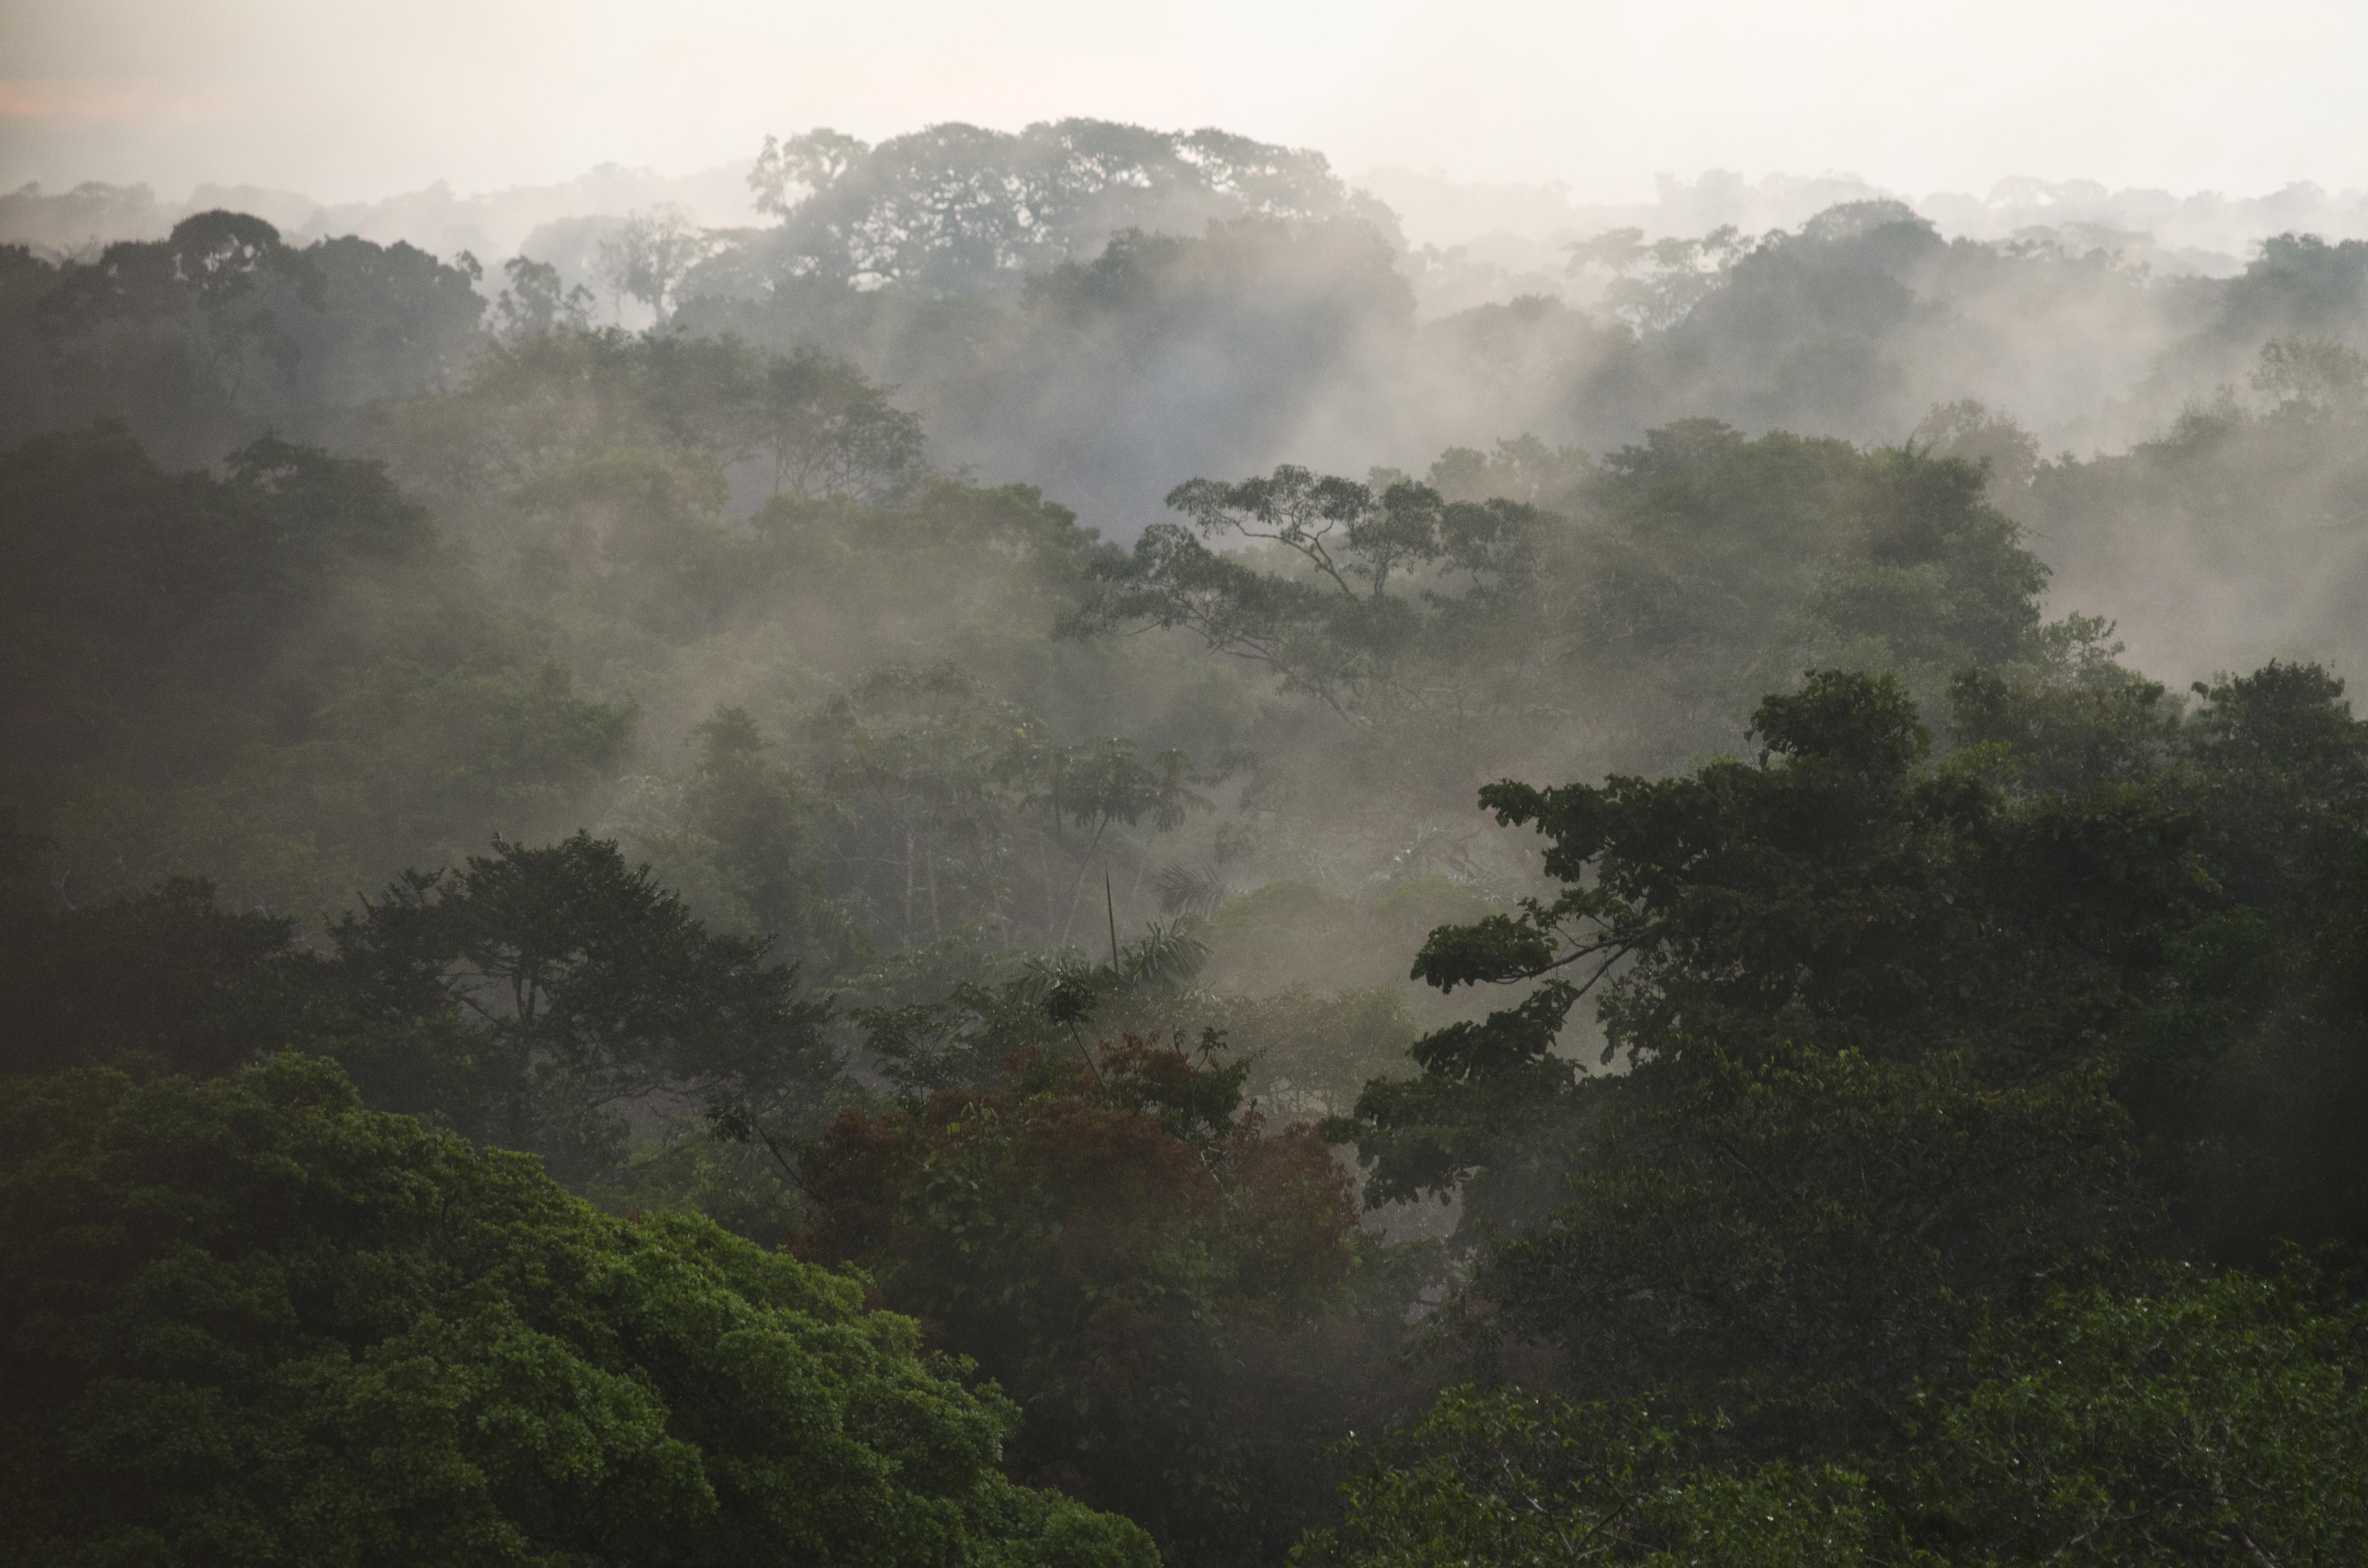 Canopy Scenic, Yasuni National Park, Amazon Rainforest, Ecuador